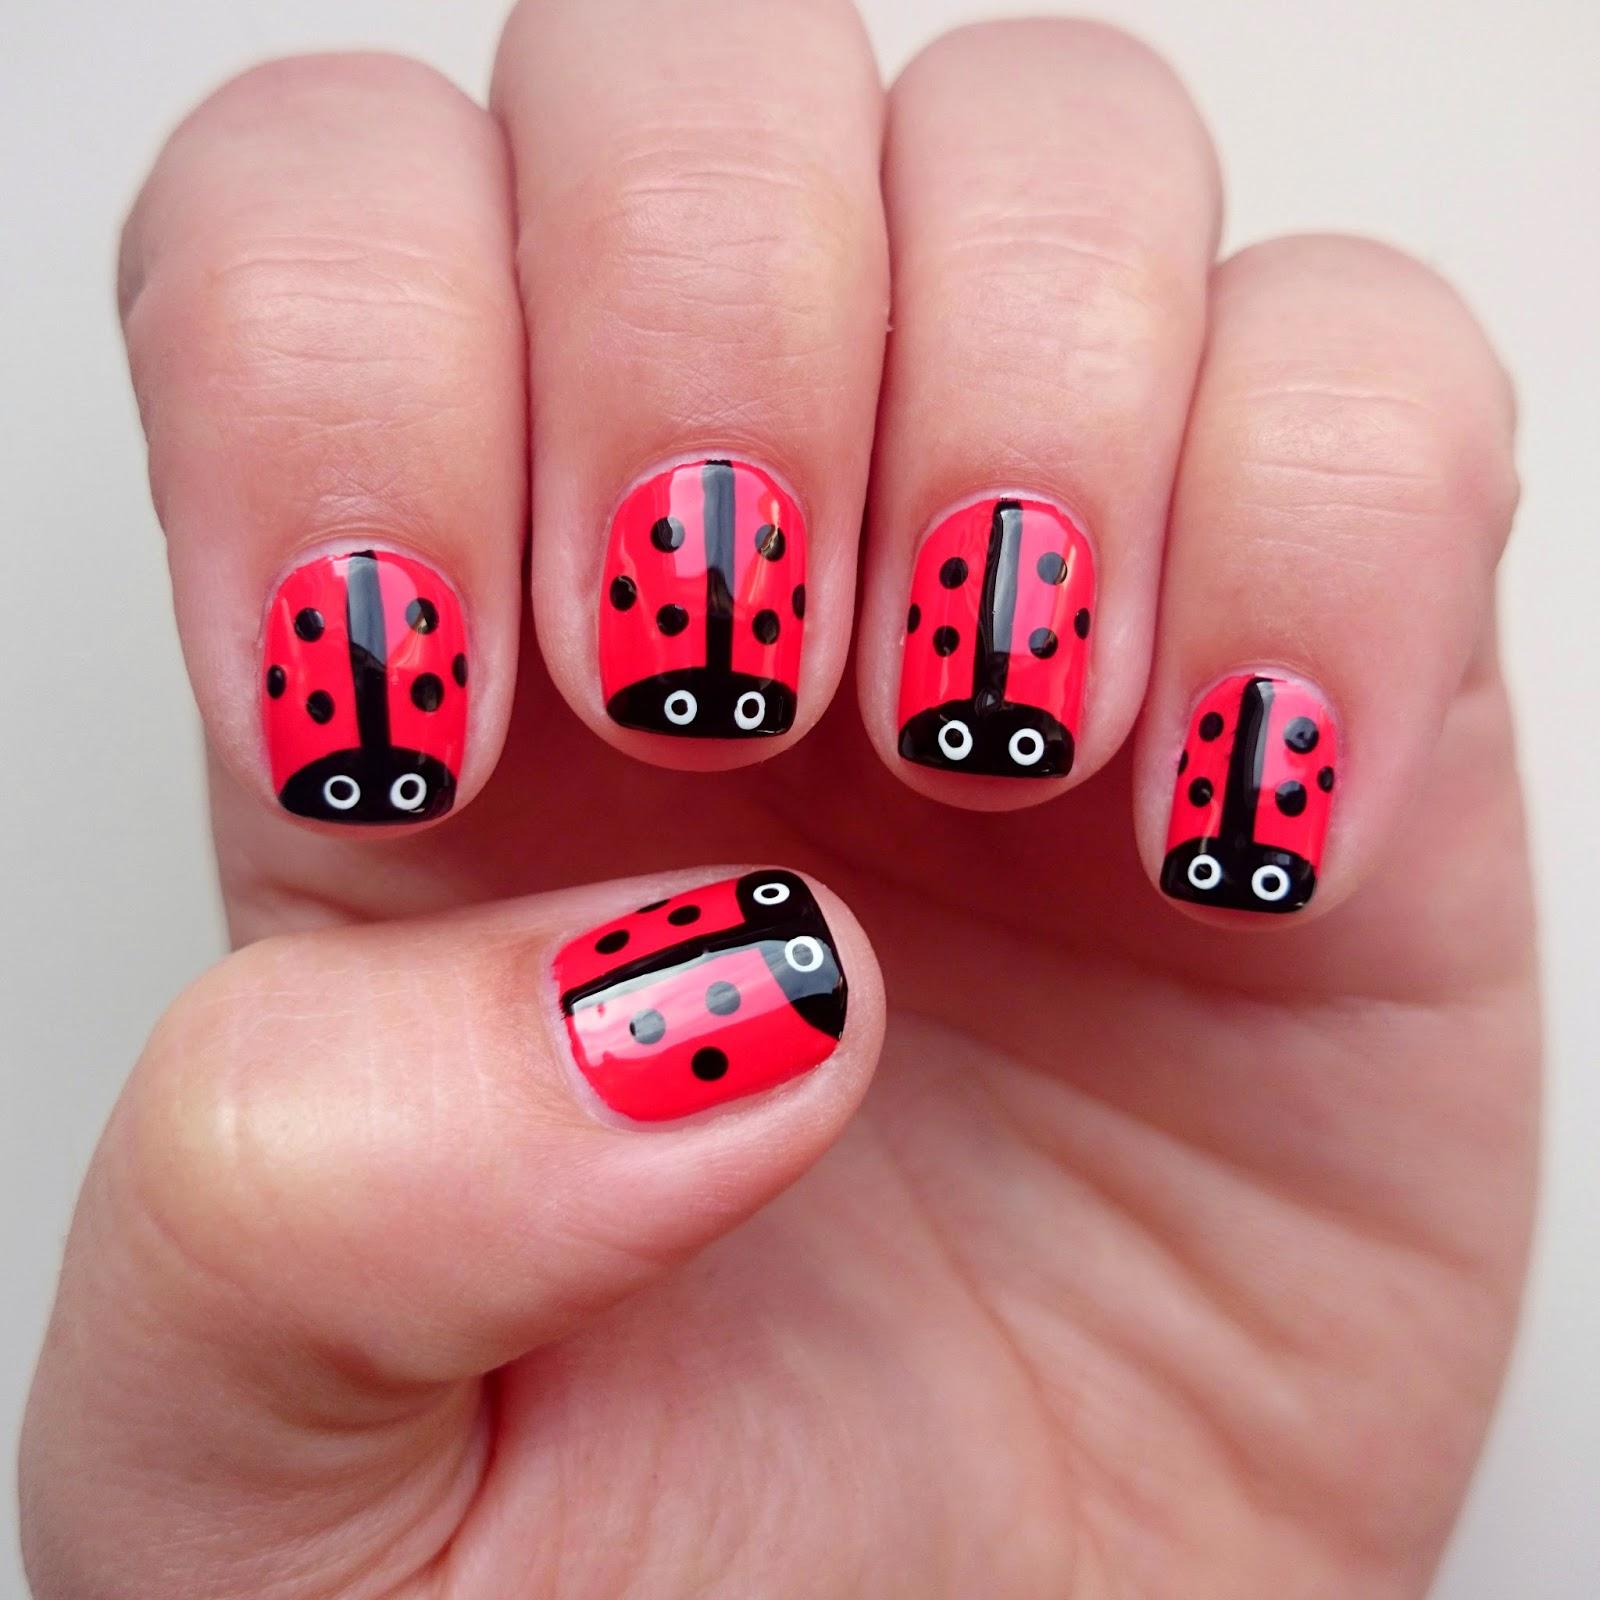 27 lazy girl nail art ideas that are actually easy buzzfeed little girl nail design - Little Girl Nail Design Ideas